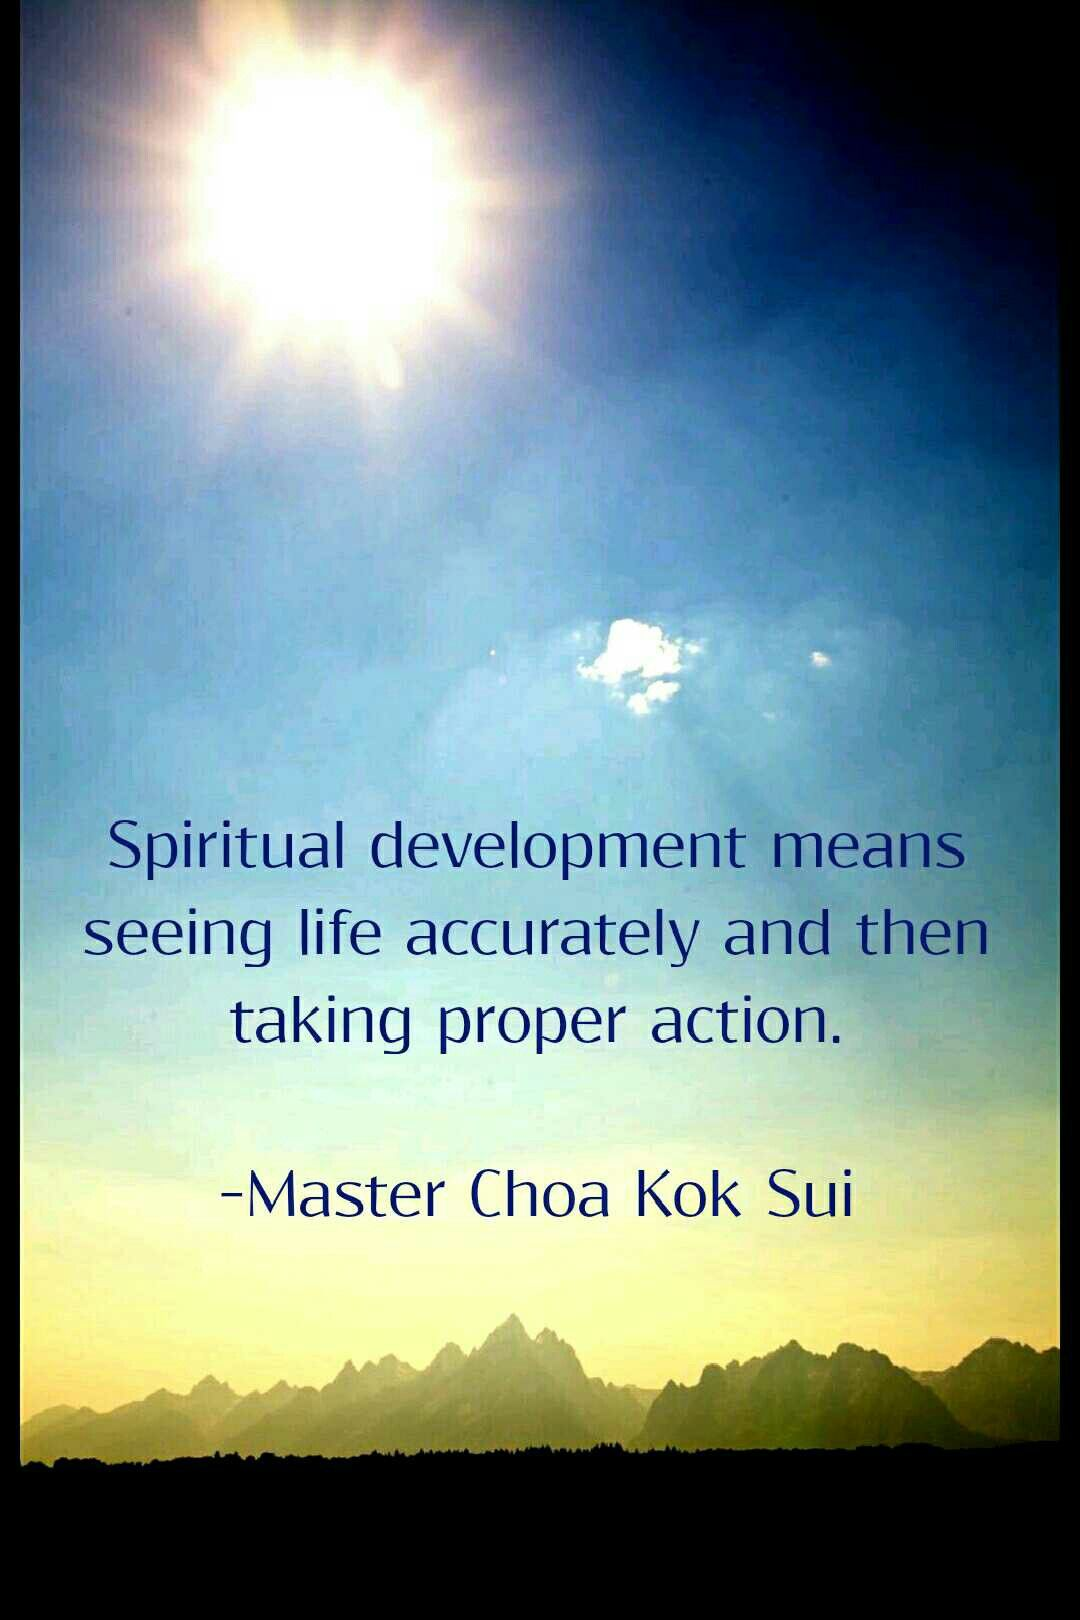 Life Spiritual Quotes Unique Quotes Unfoldapp Mcks Spirituality Development Action Life